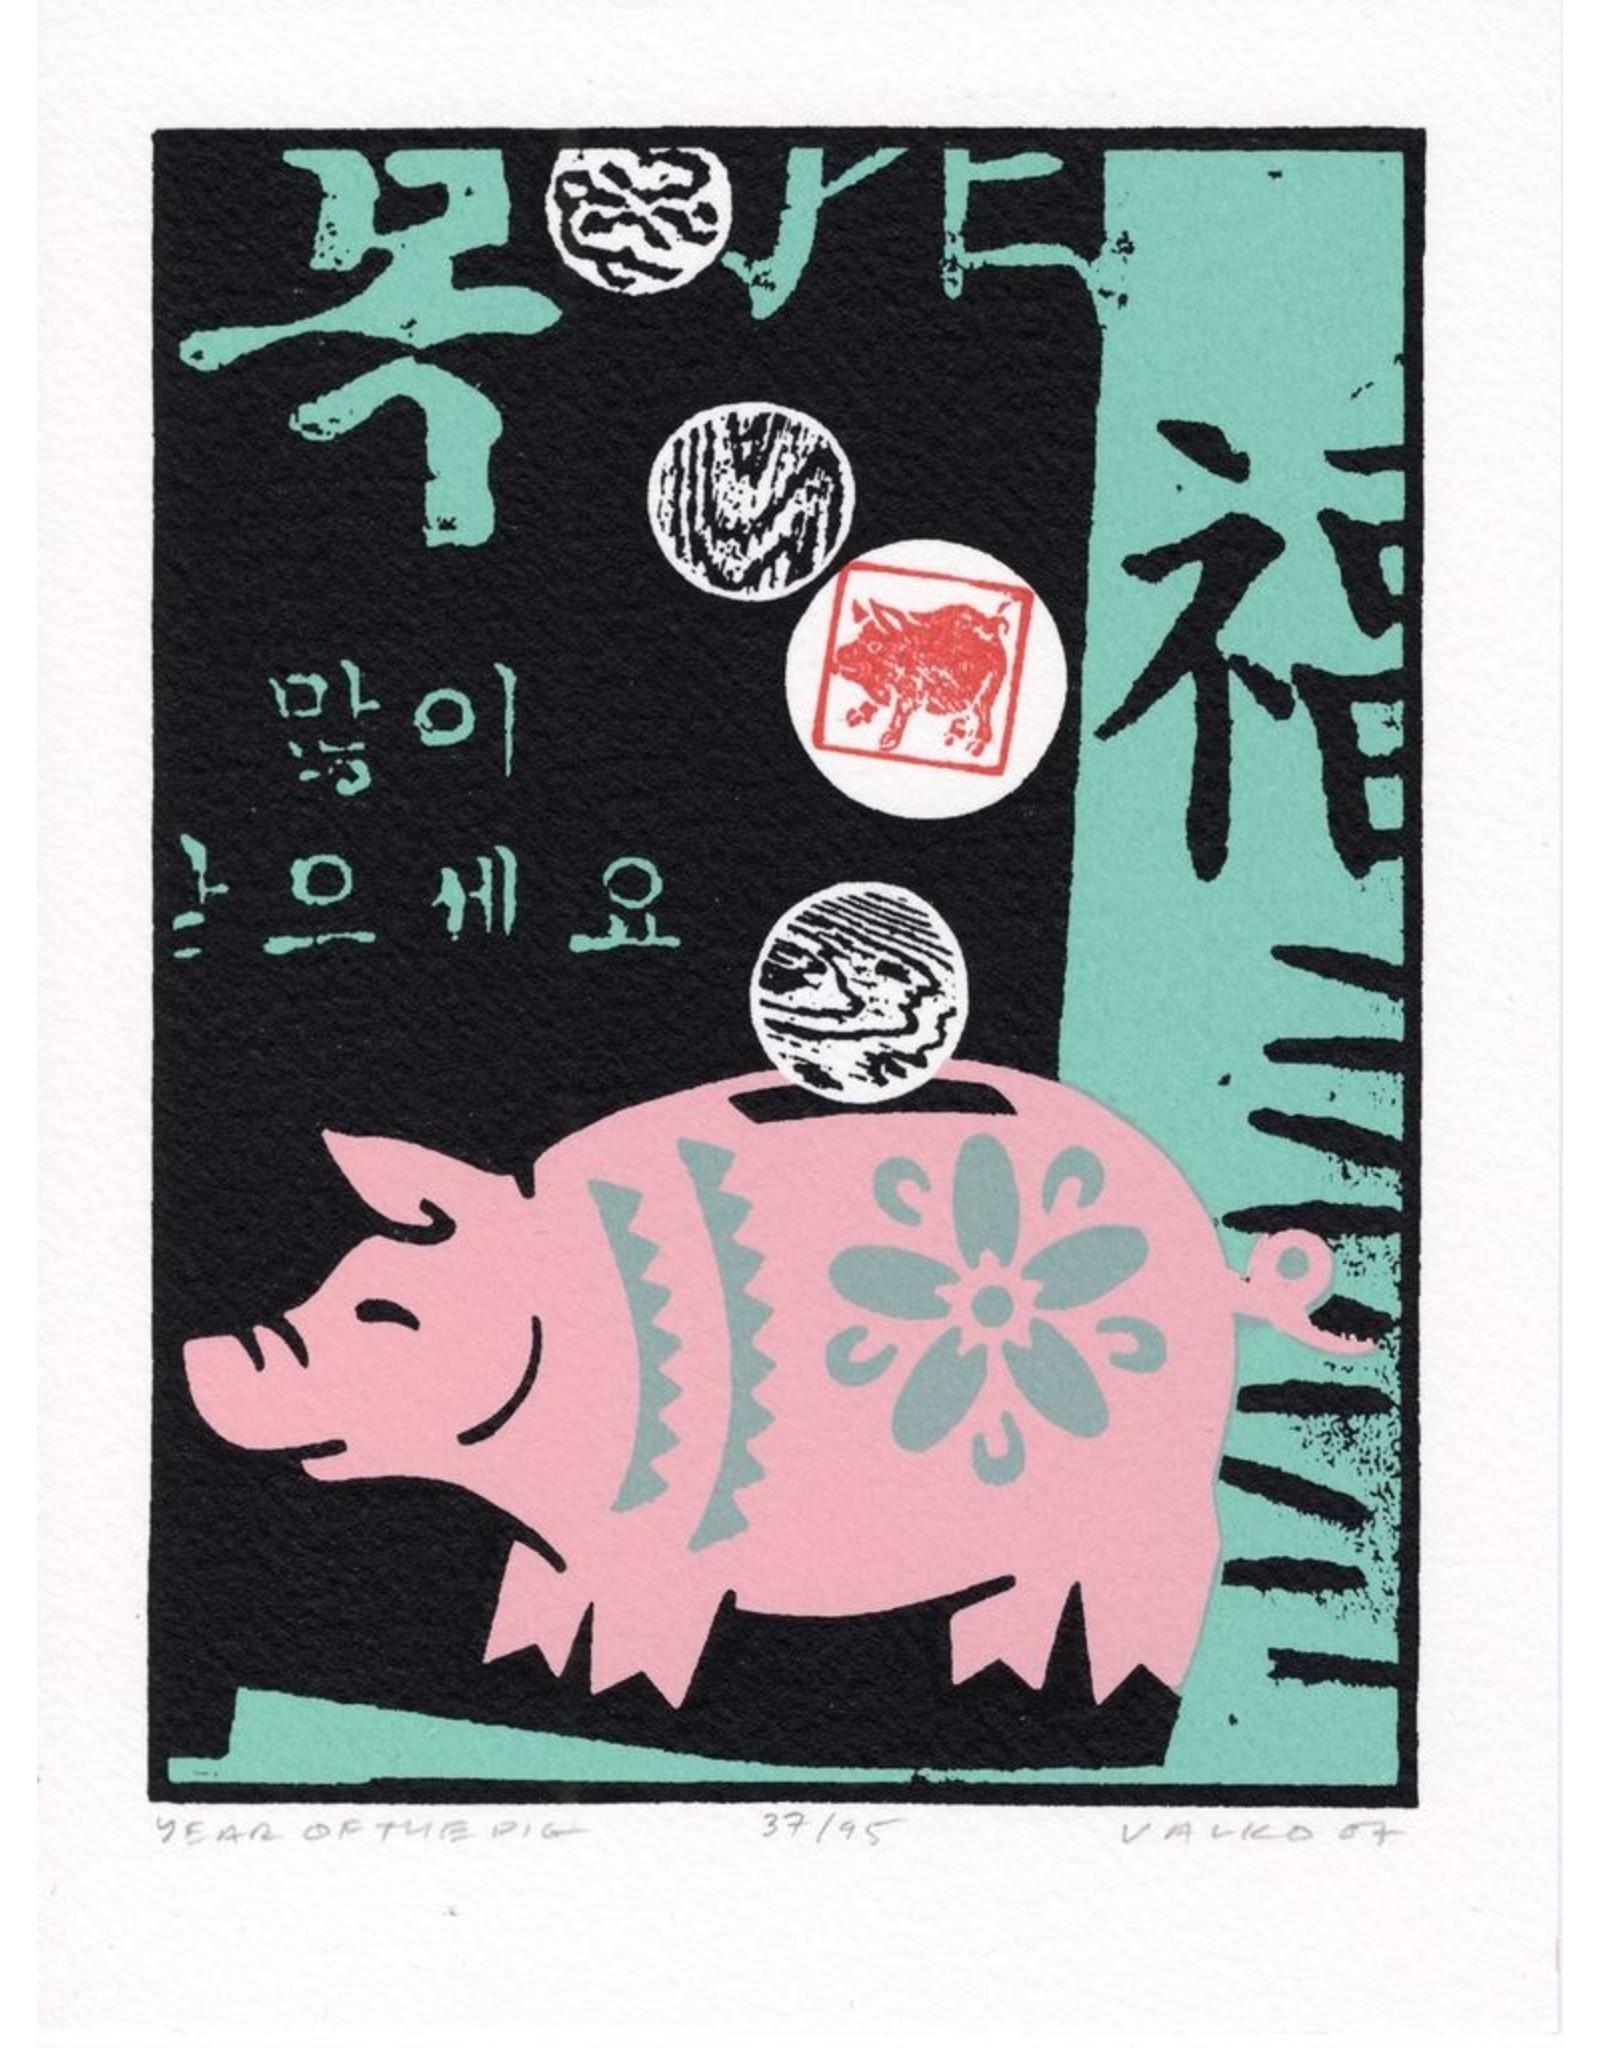 Valko, Andrew Year of the Pig, Andrew Valko